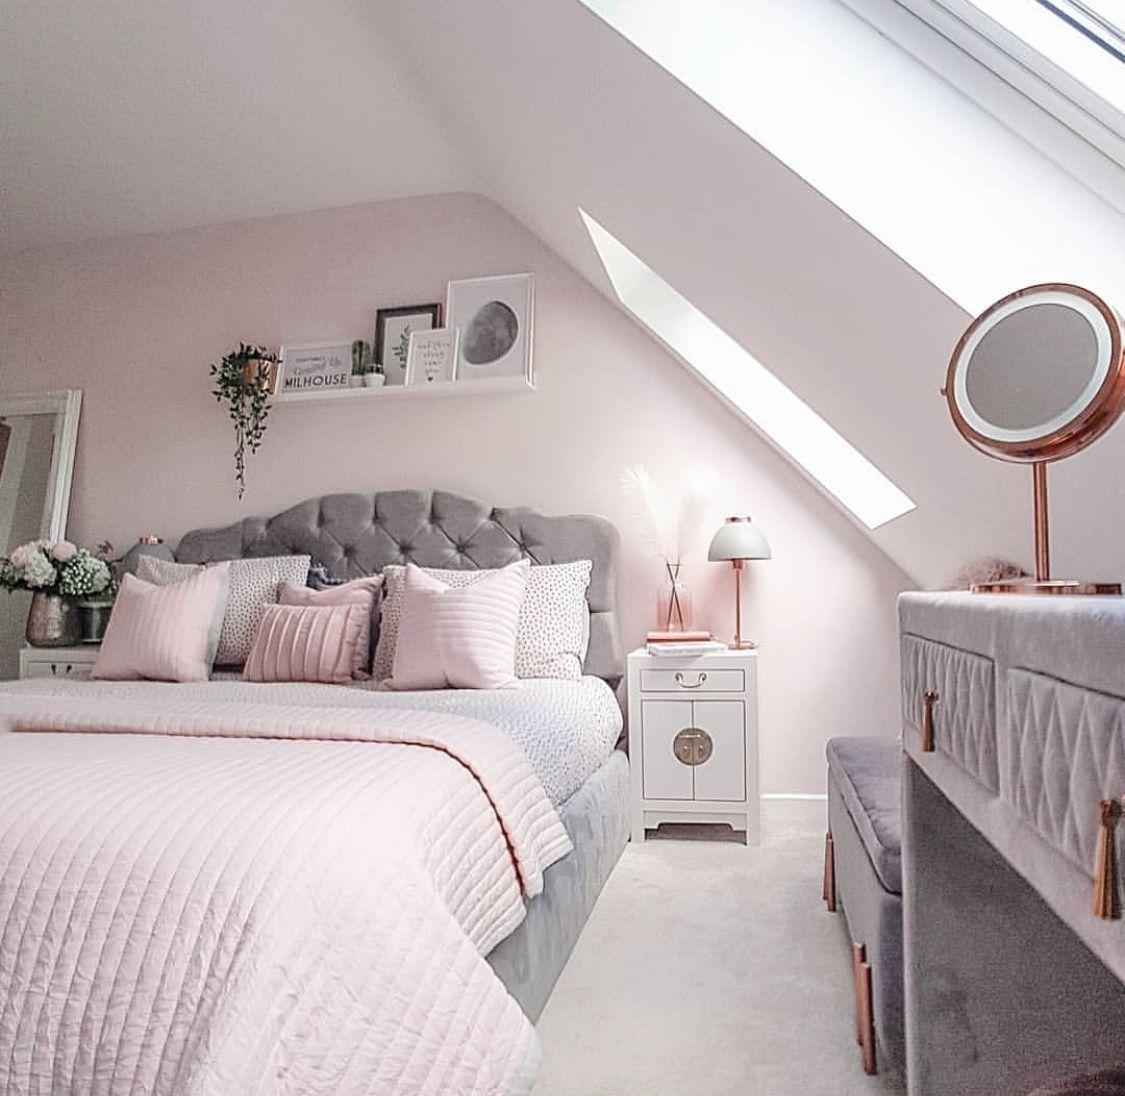 Pinterest Scottythoughts Bedroom Decor Grey Pink Stylish Bedroom Design Bedroom Decor For Couples